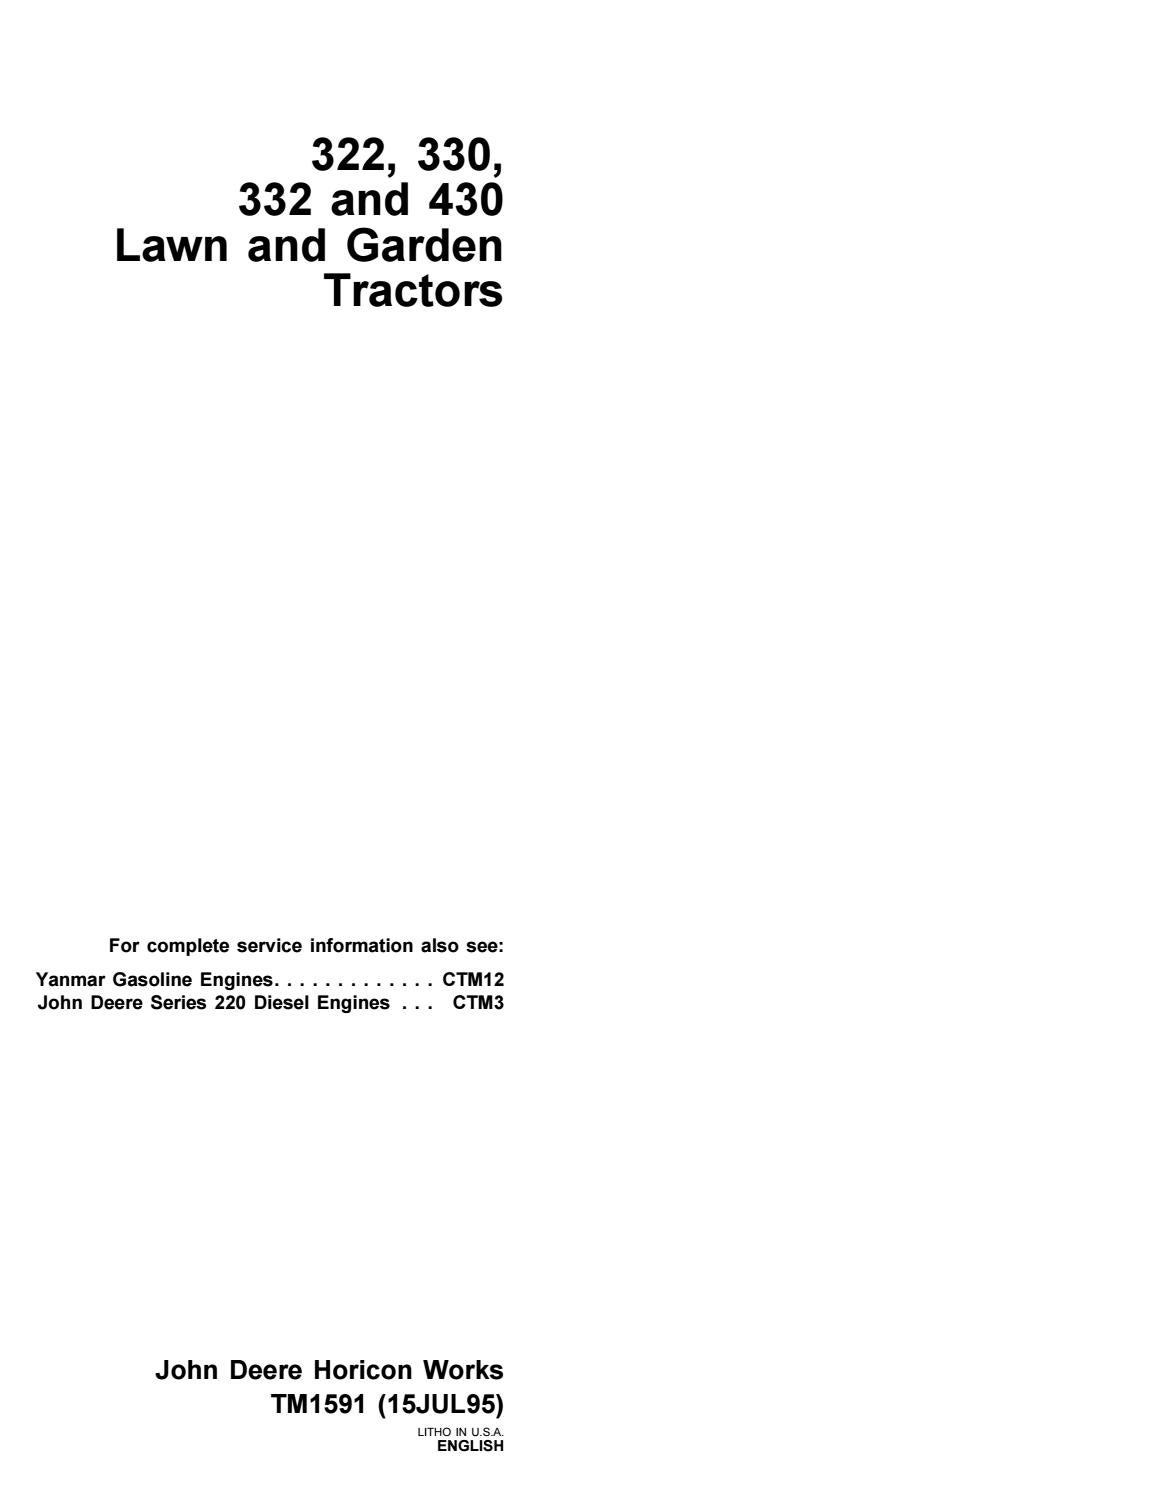 John deere 332 lawn garden tractor service repair manual by